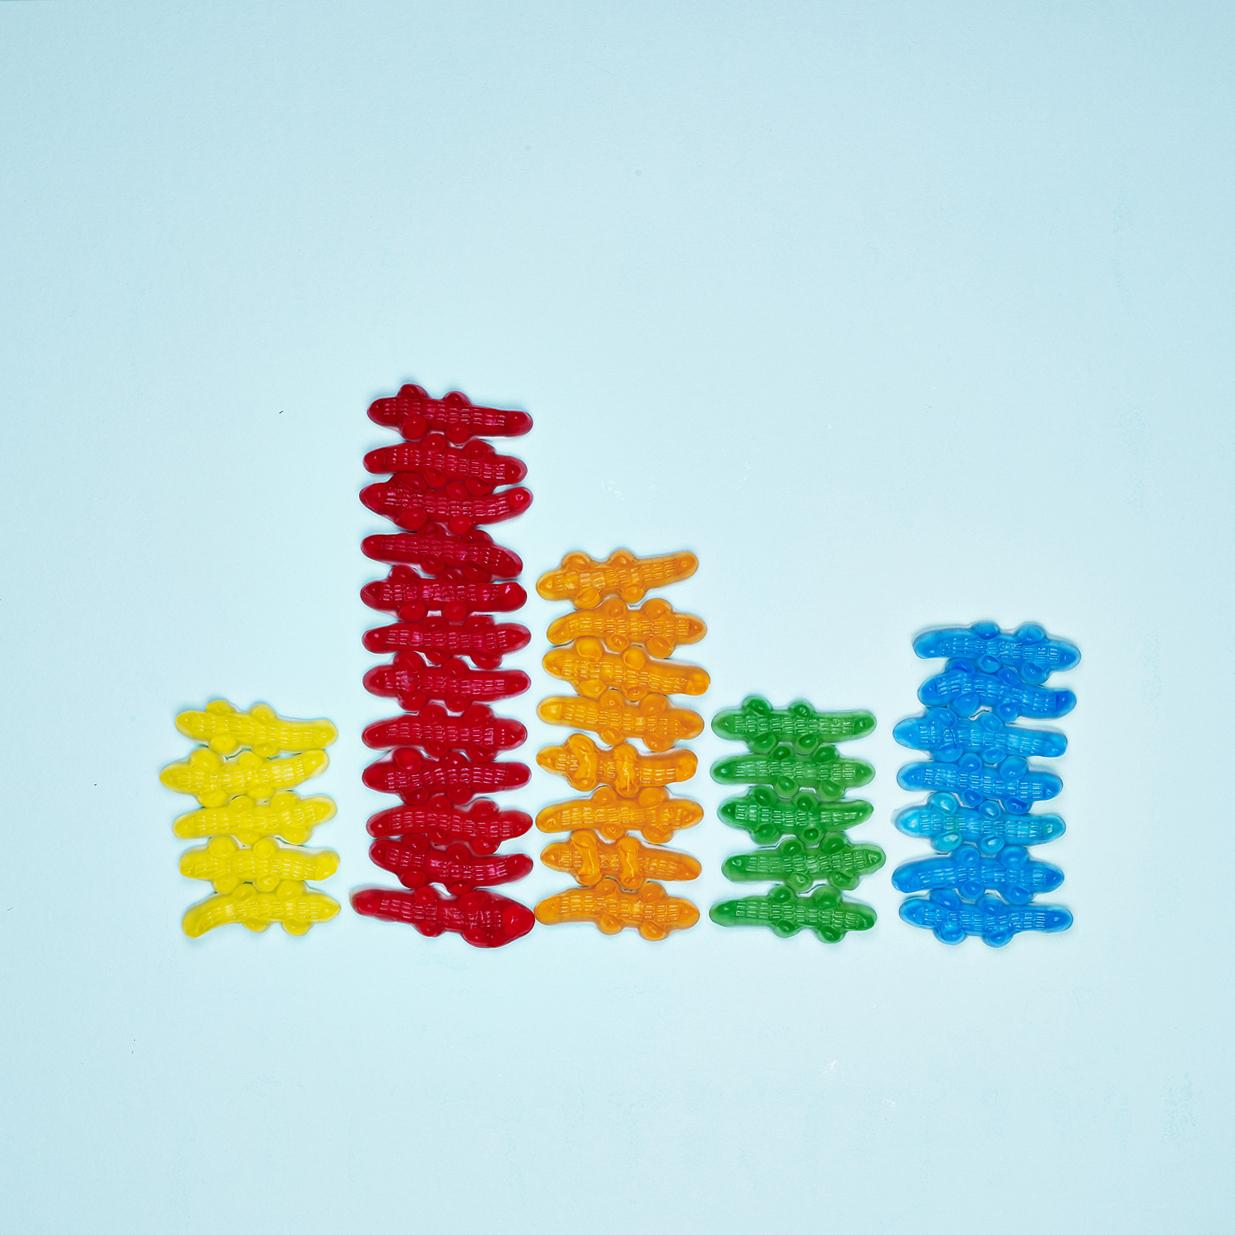 Crocodiles:  Yellow 13.51% / Red 32.43% / Orange 21.62% /  Green 13.51% / Blue 18.91%.    (1 x 200g)